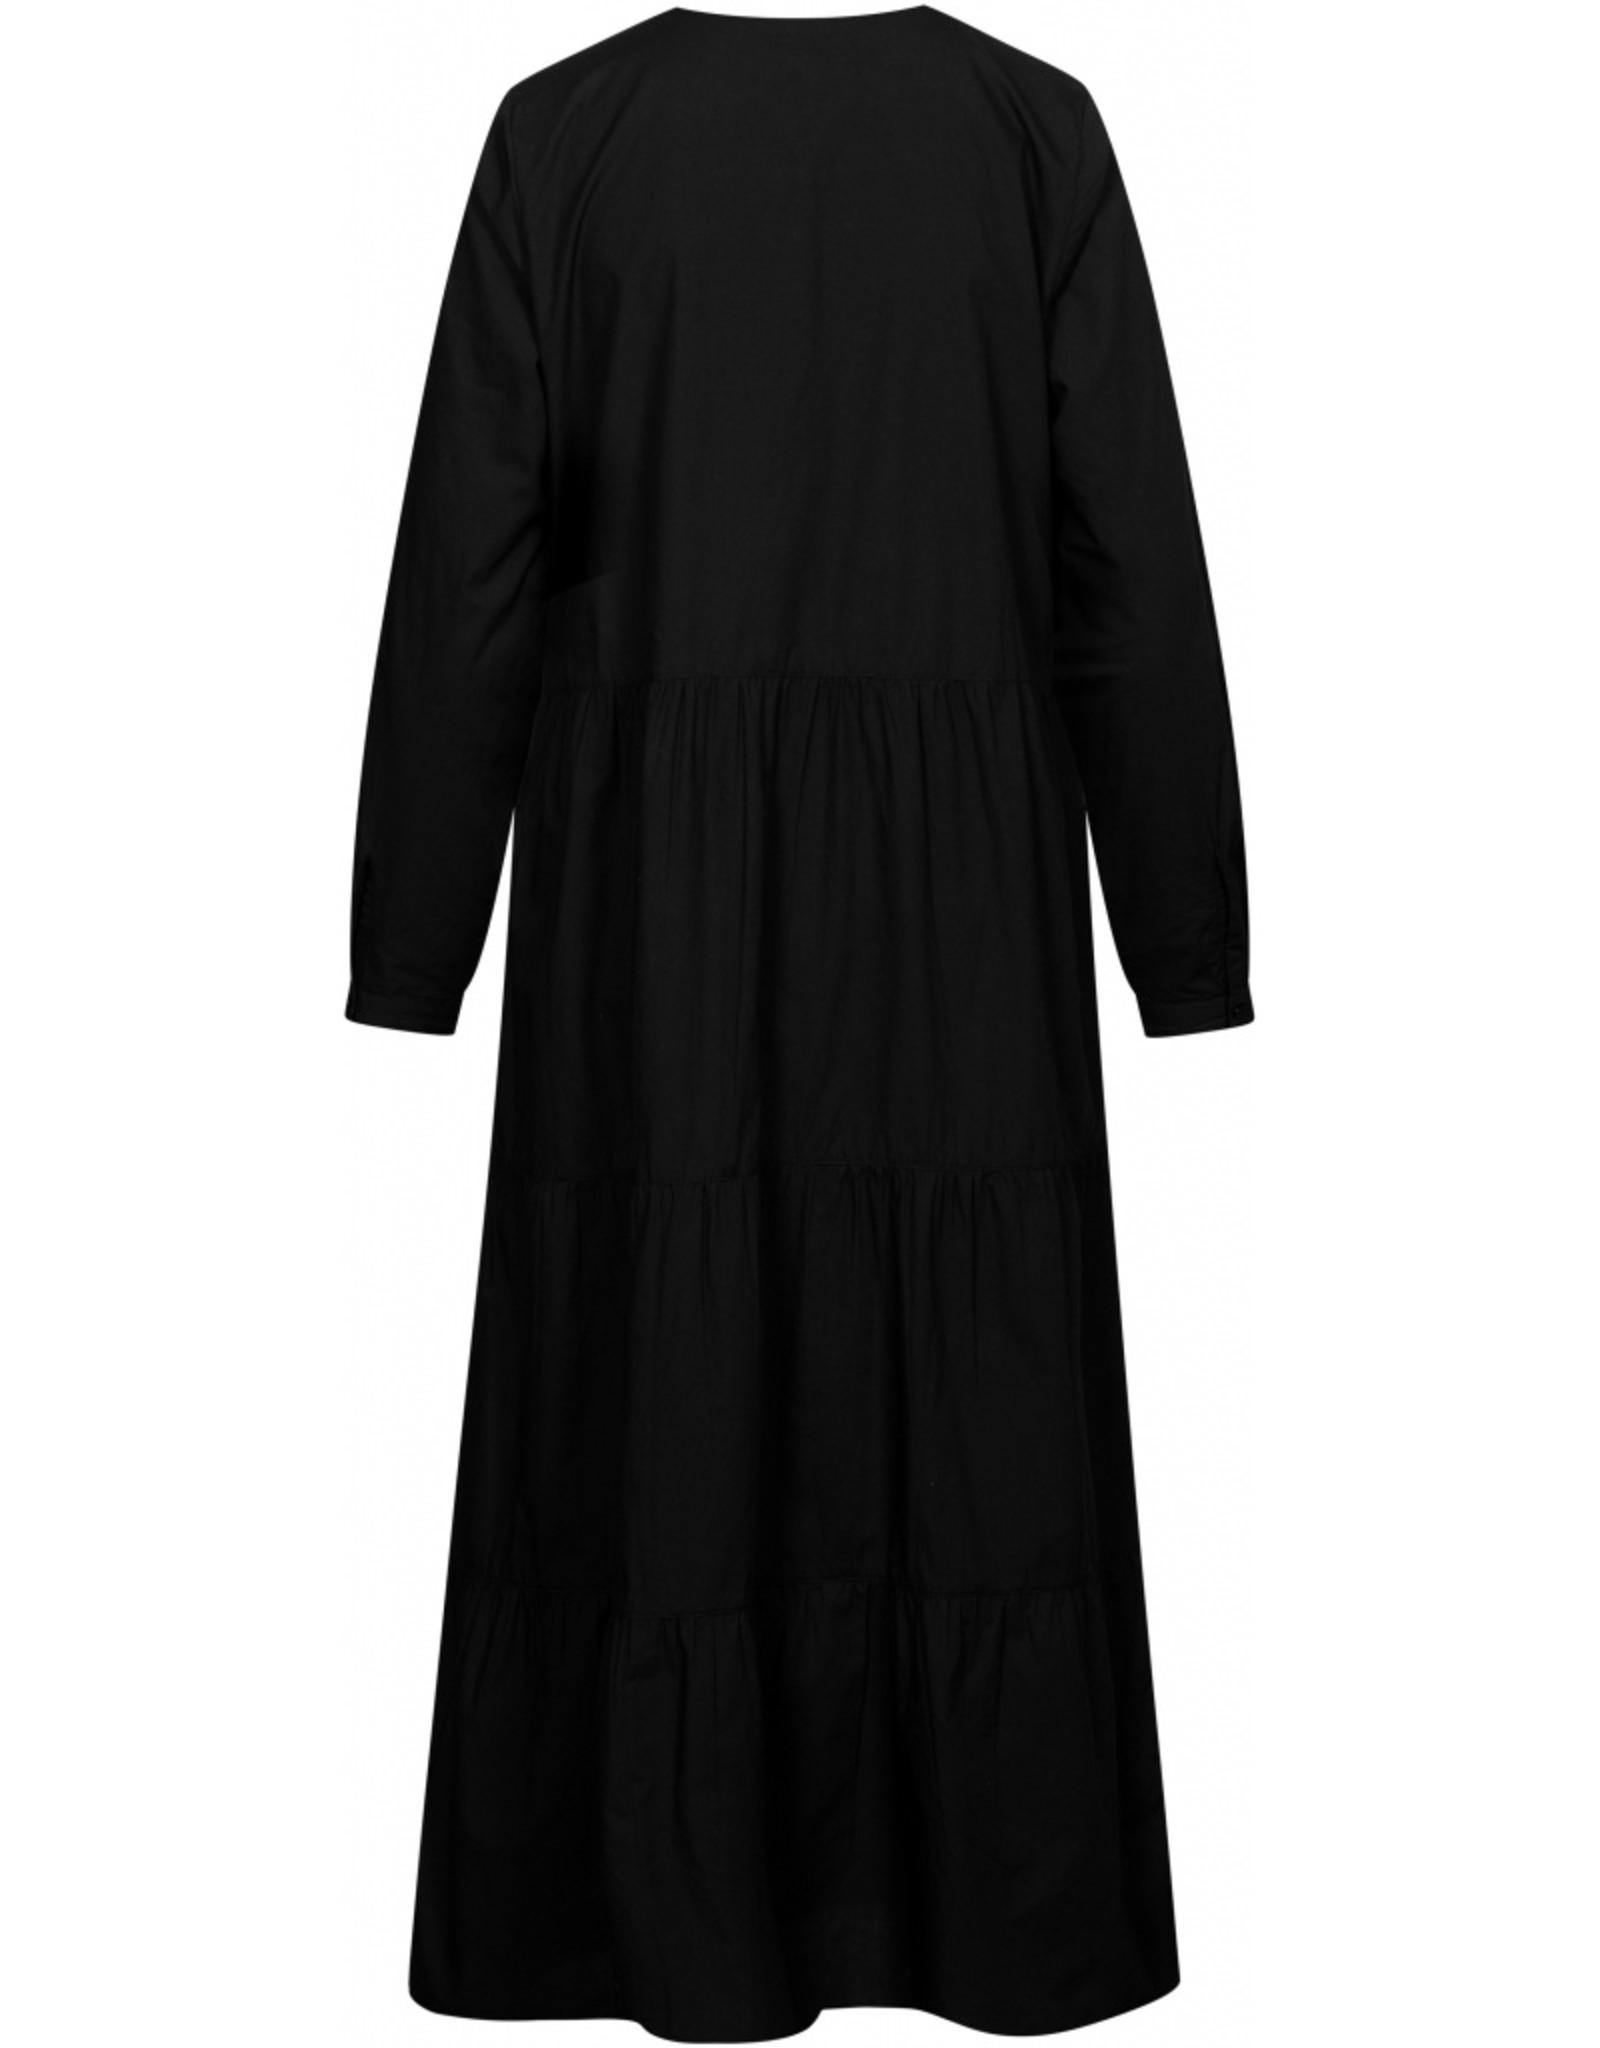 Gai&Lisva dress 'Tanja' cotton - black